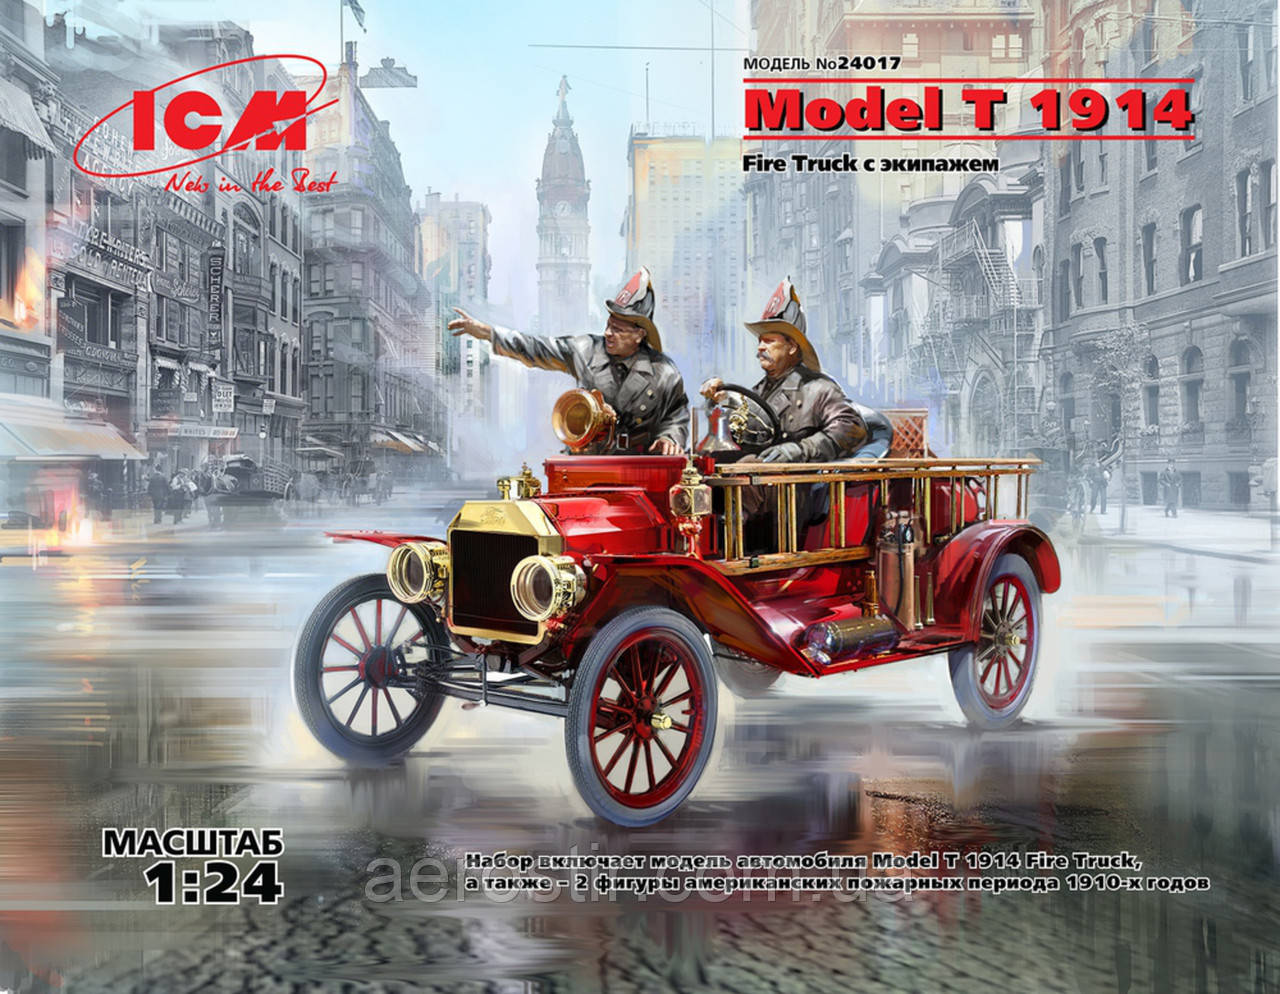 Model T 1914 Fire Truck с экипажем 1/24 ICM 24017